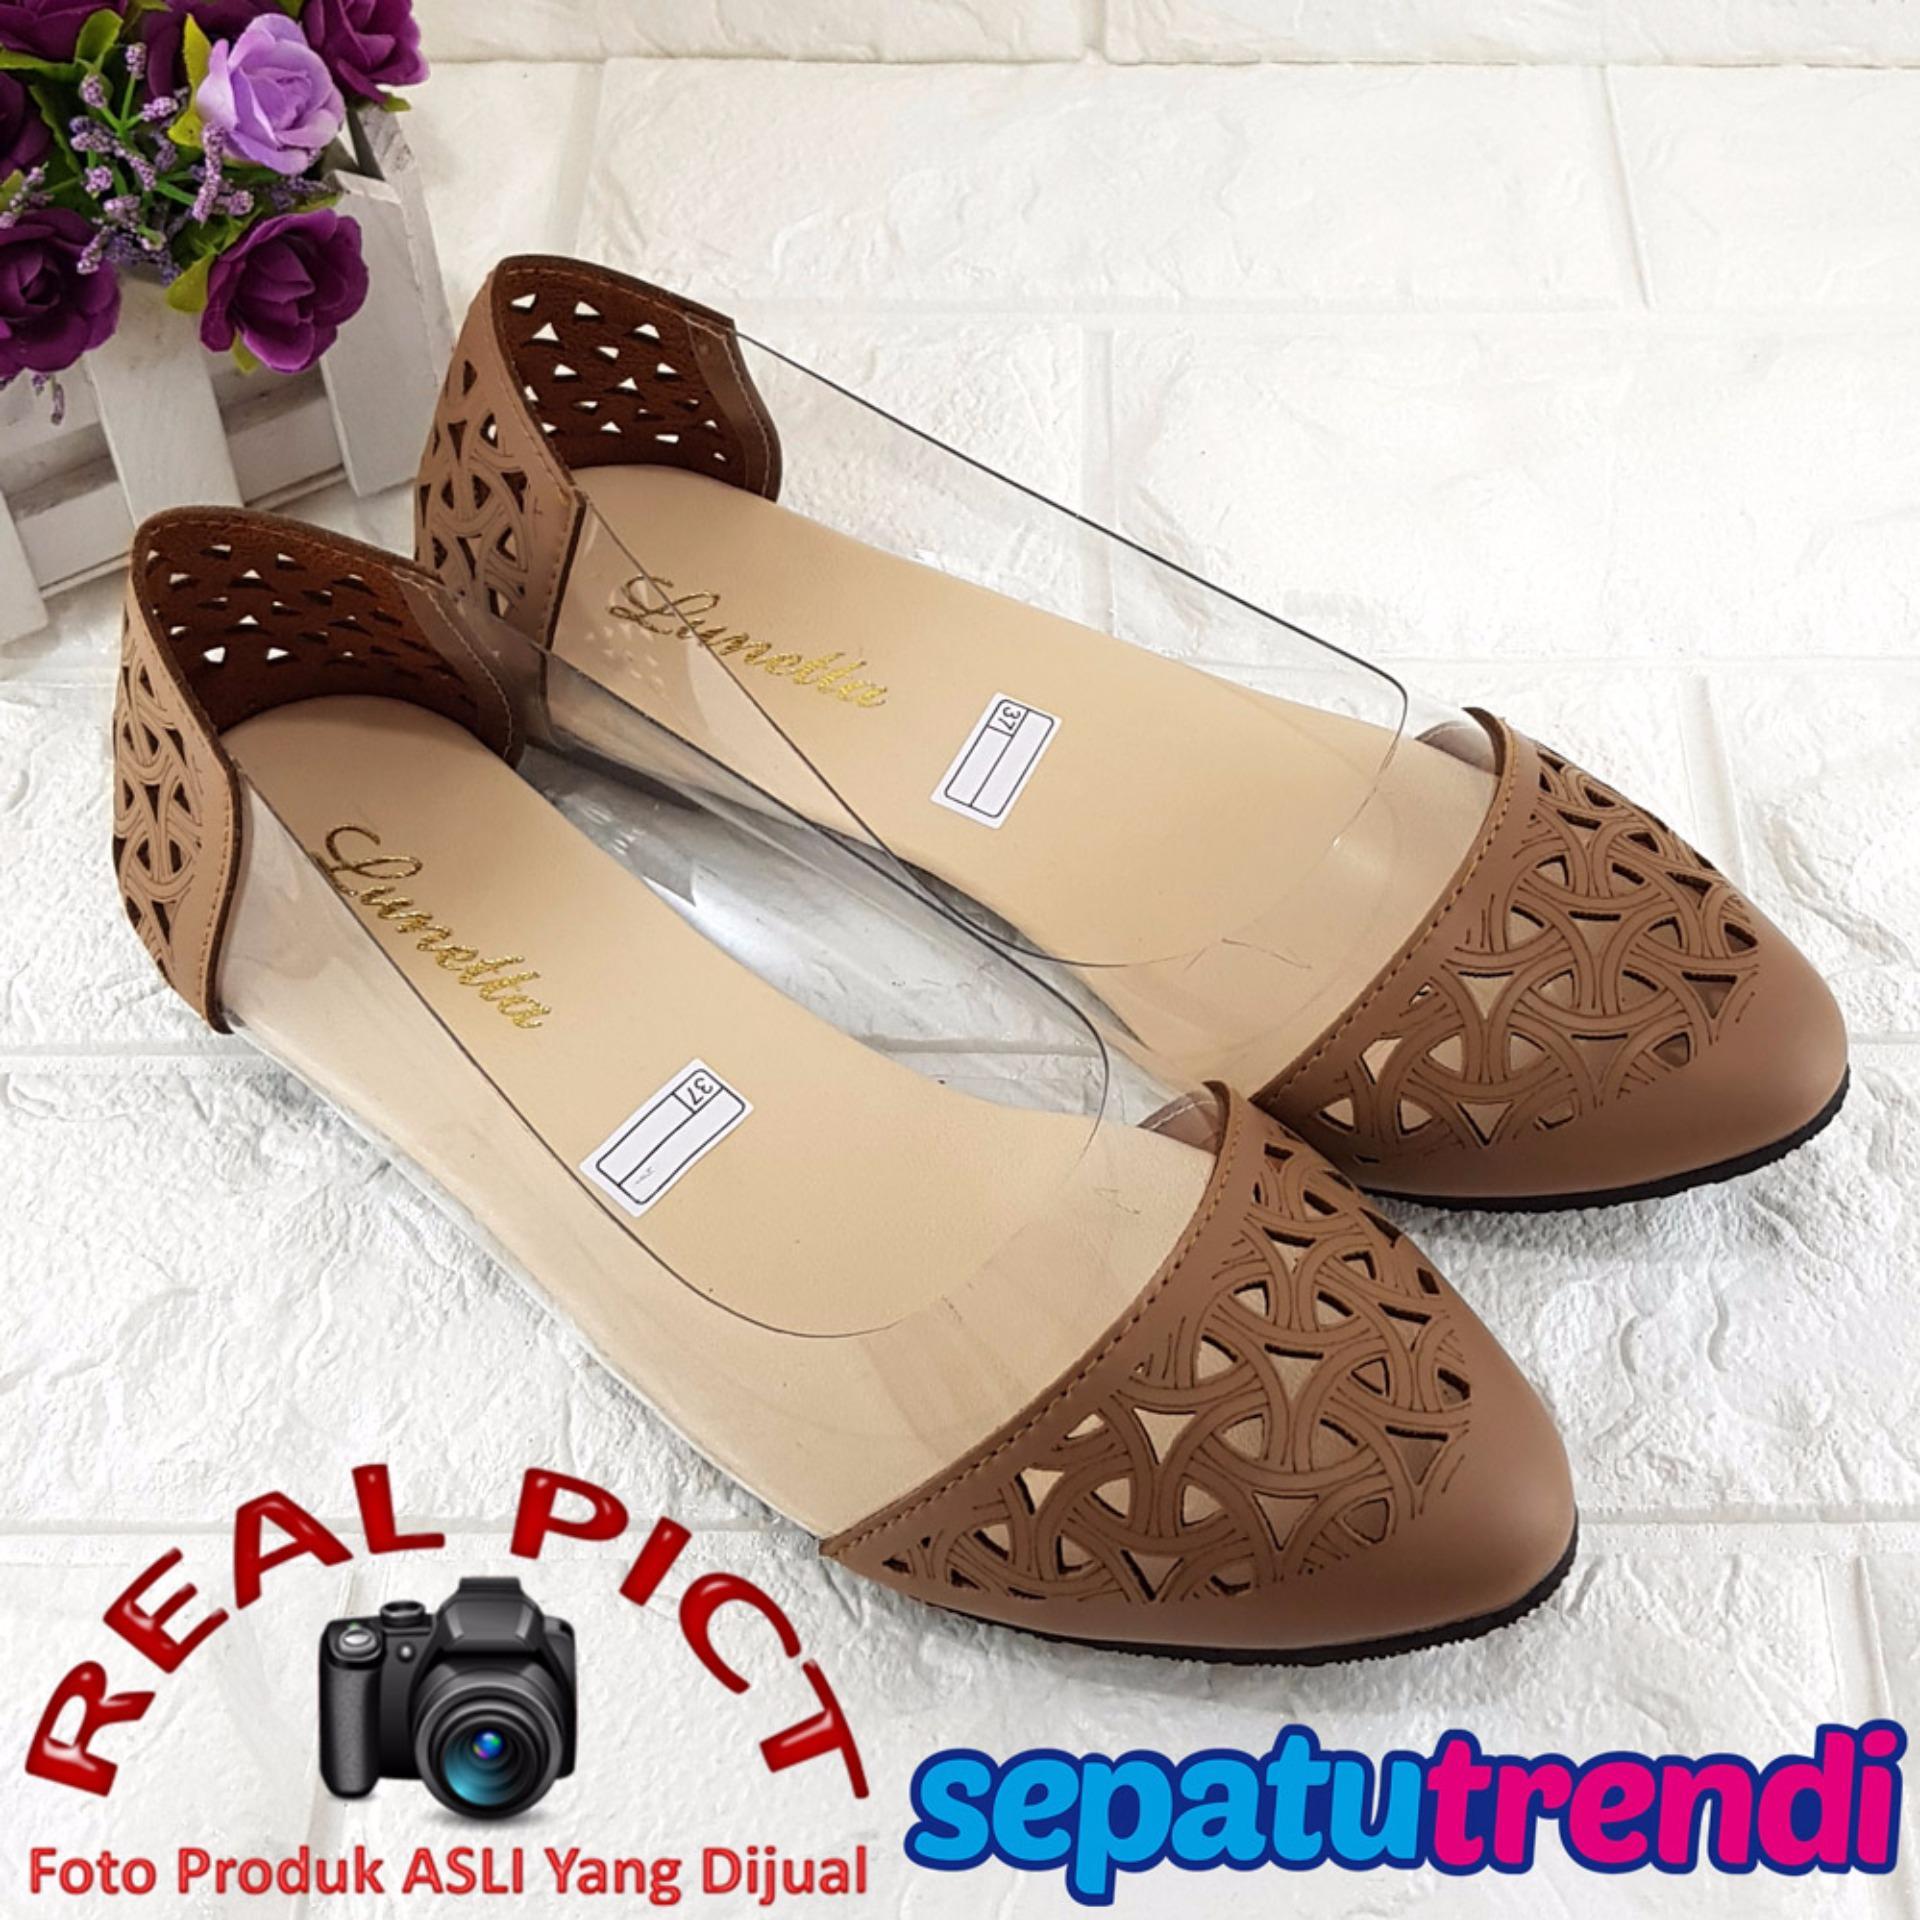 TRENDISHOES SEPATU WANITA FLAT SHOES ANGKLE STRAP TRANS SIDE 043 HITAM Sepatu